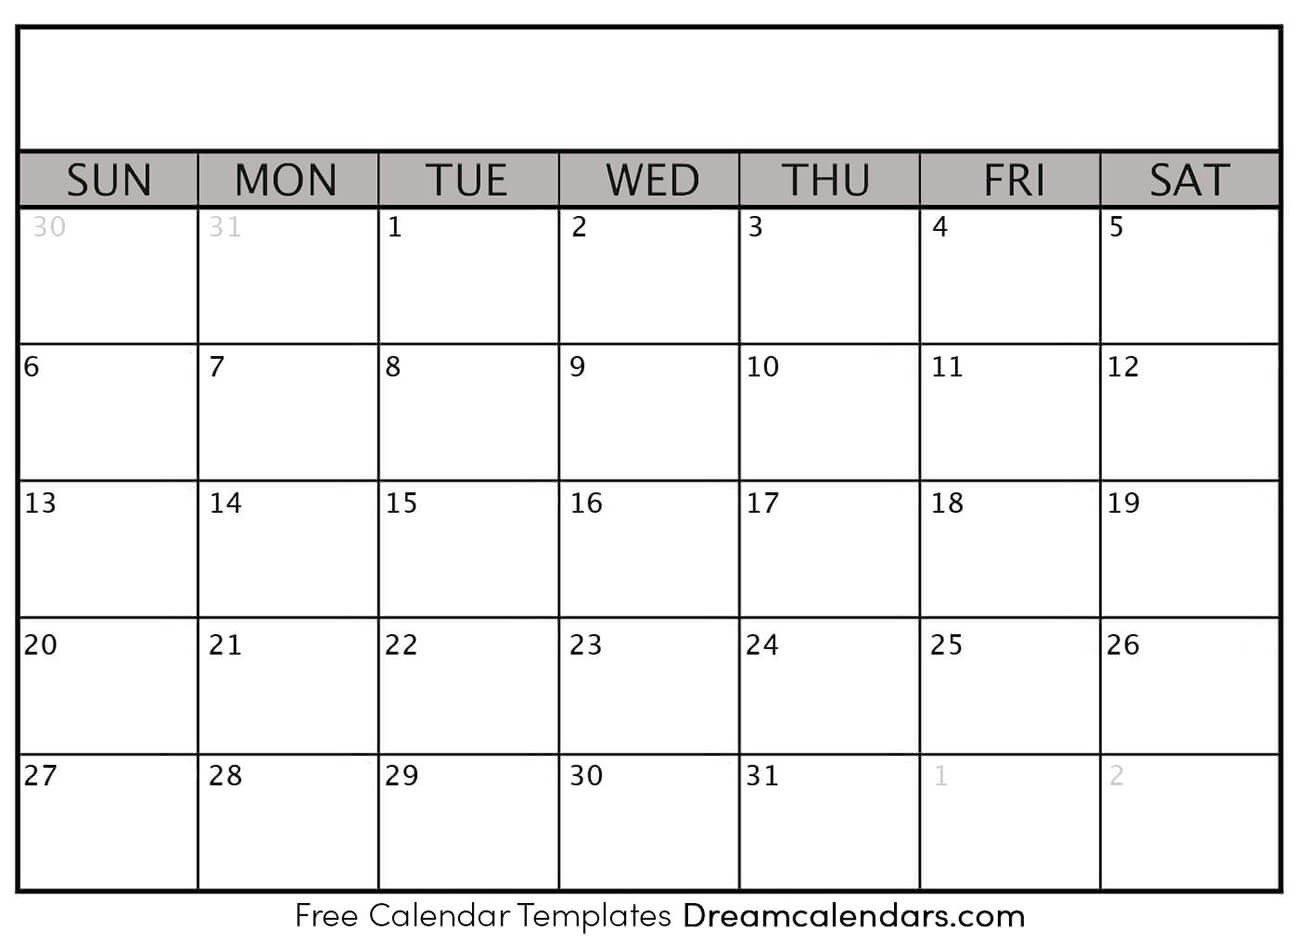 Blank Calendar 2020 To Fill In | Calendar Template Printable Calendar To Fill In And Print